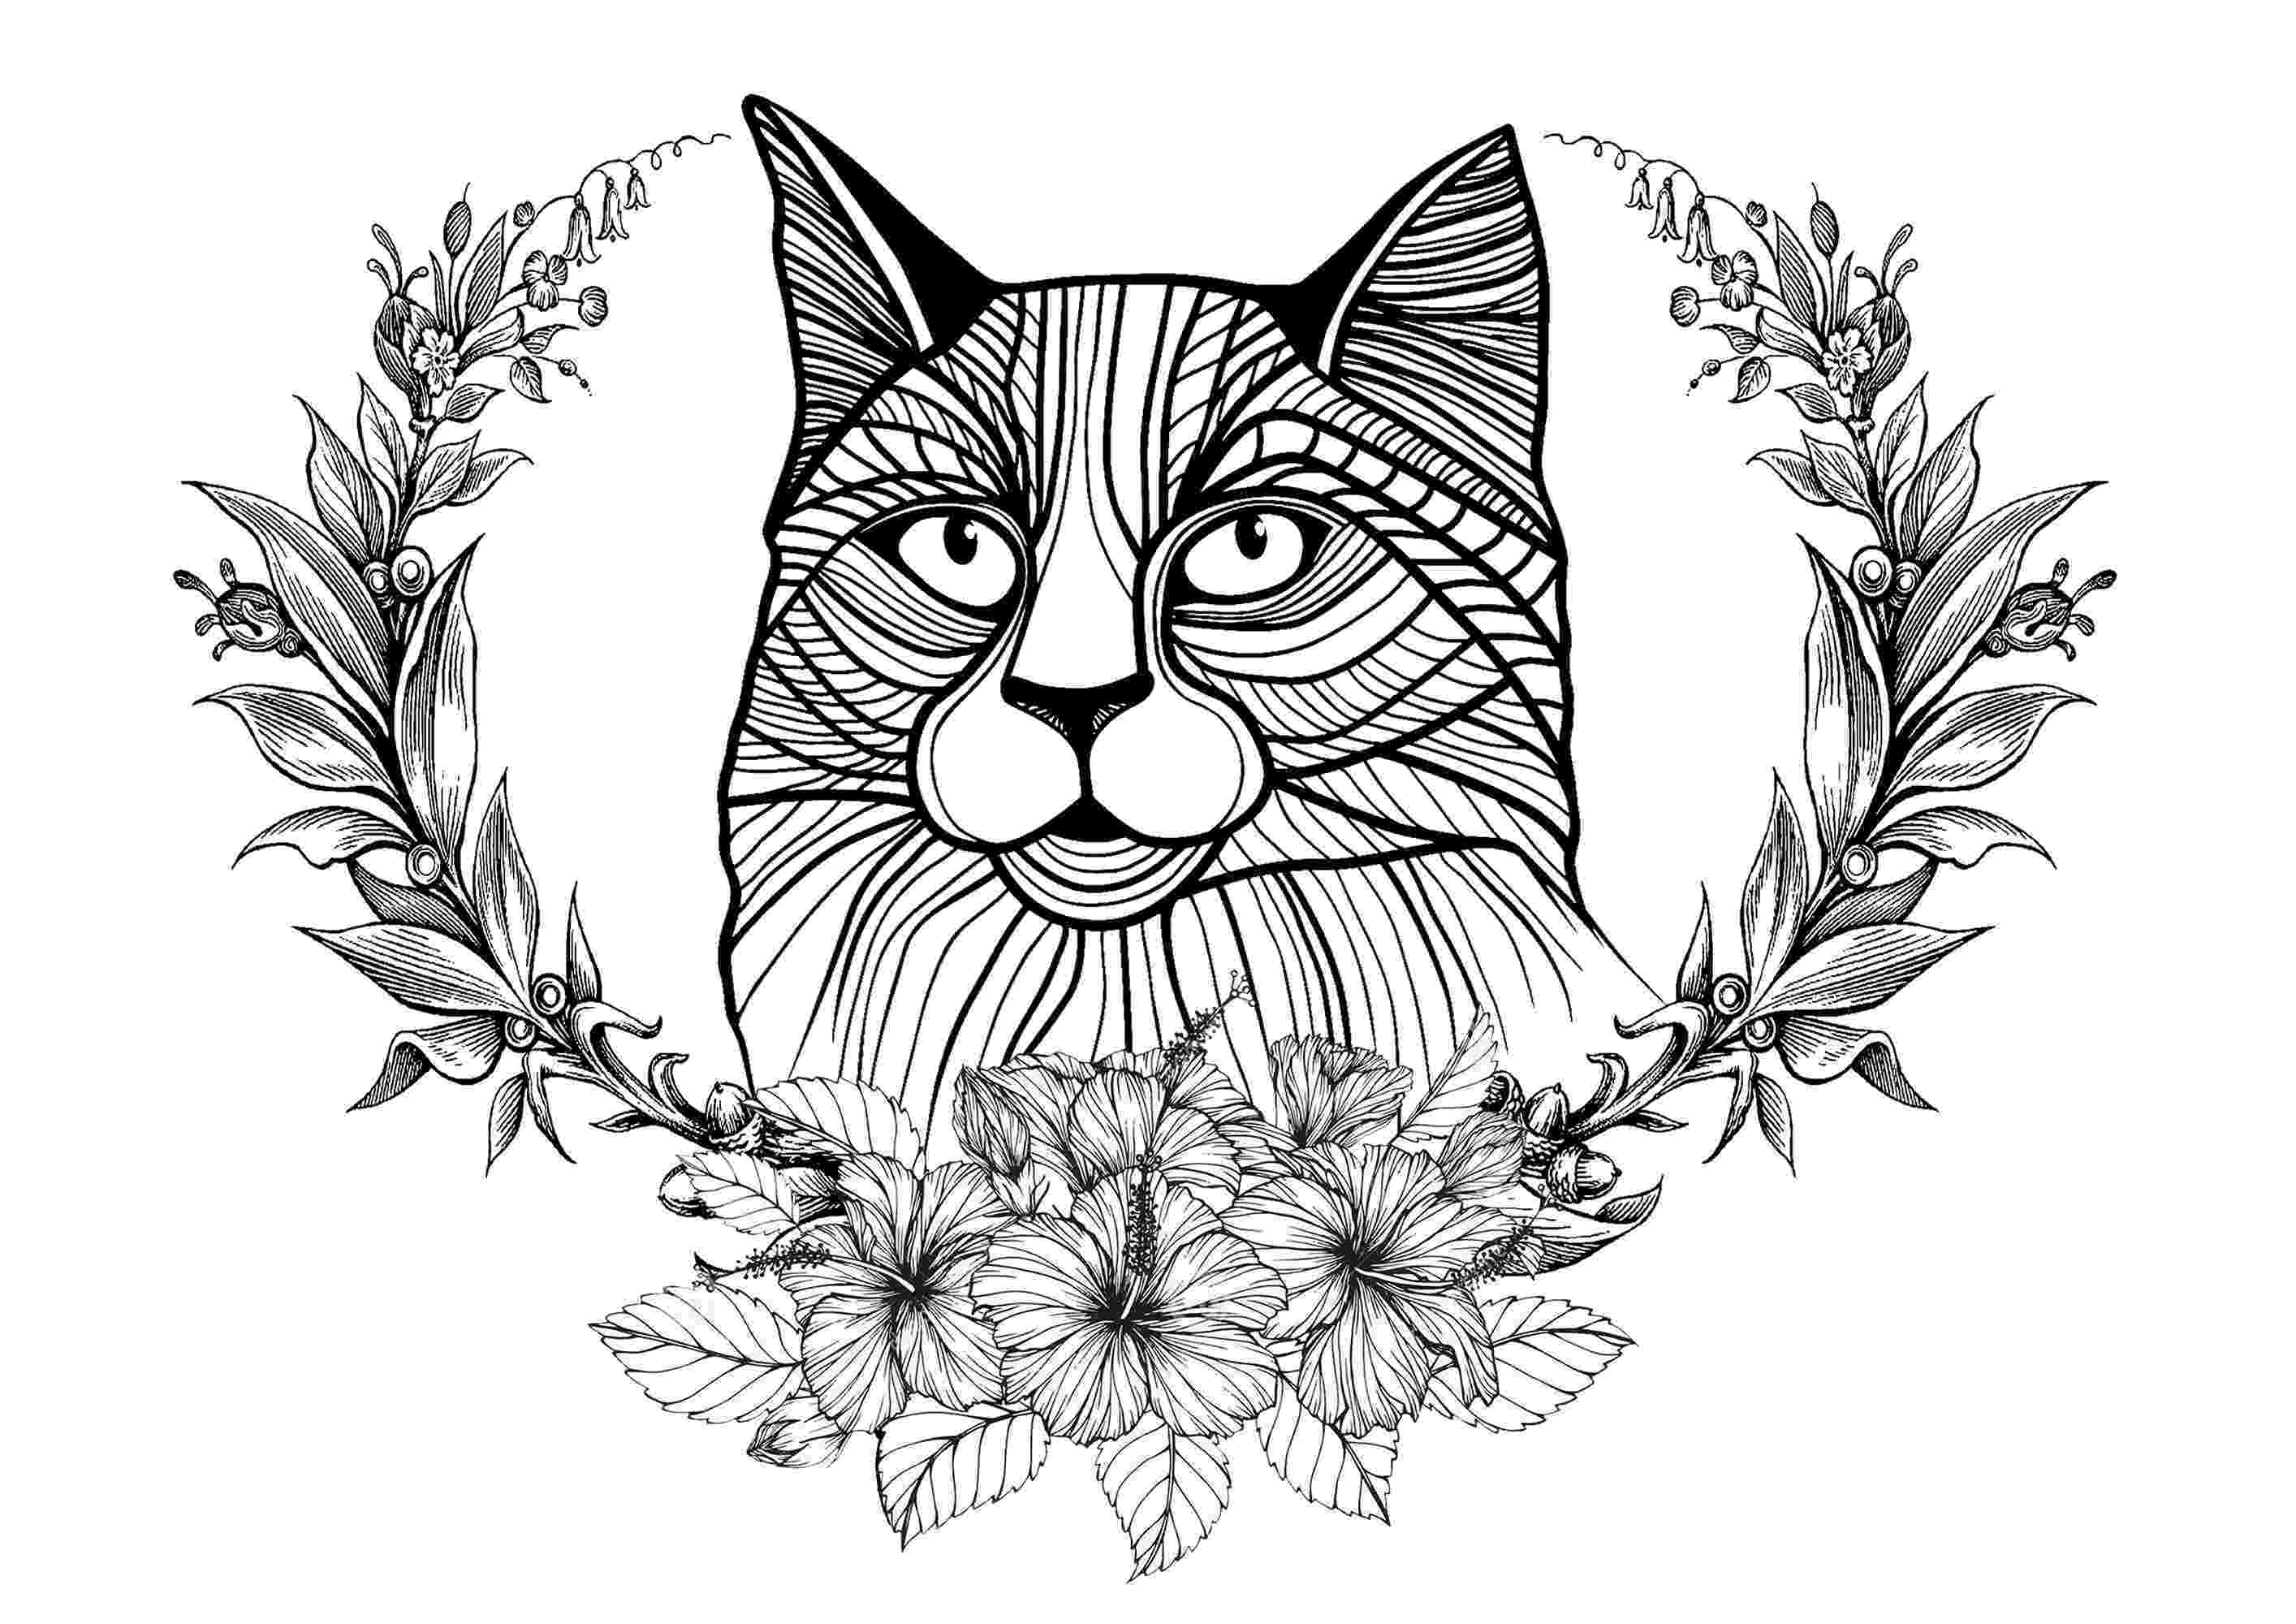 cat coloring sheets 60 cat shape templates crafts colouring pages cat coloring cat sheets